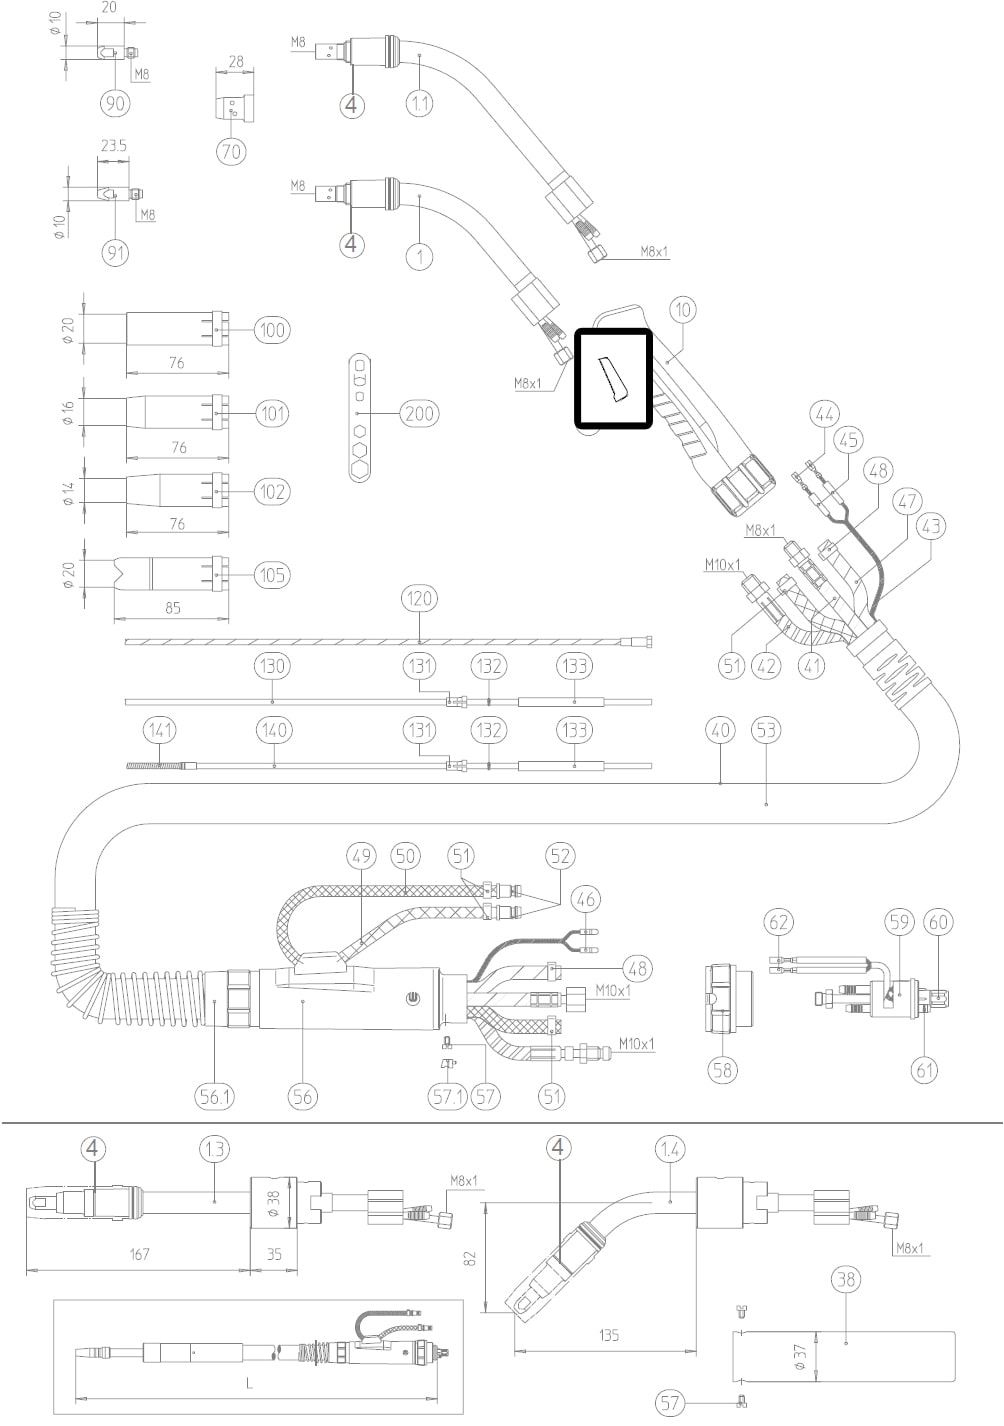 Dettaglio pulsante micro switch torcia mig abicor binzel BZ1850031